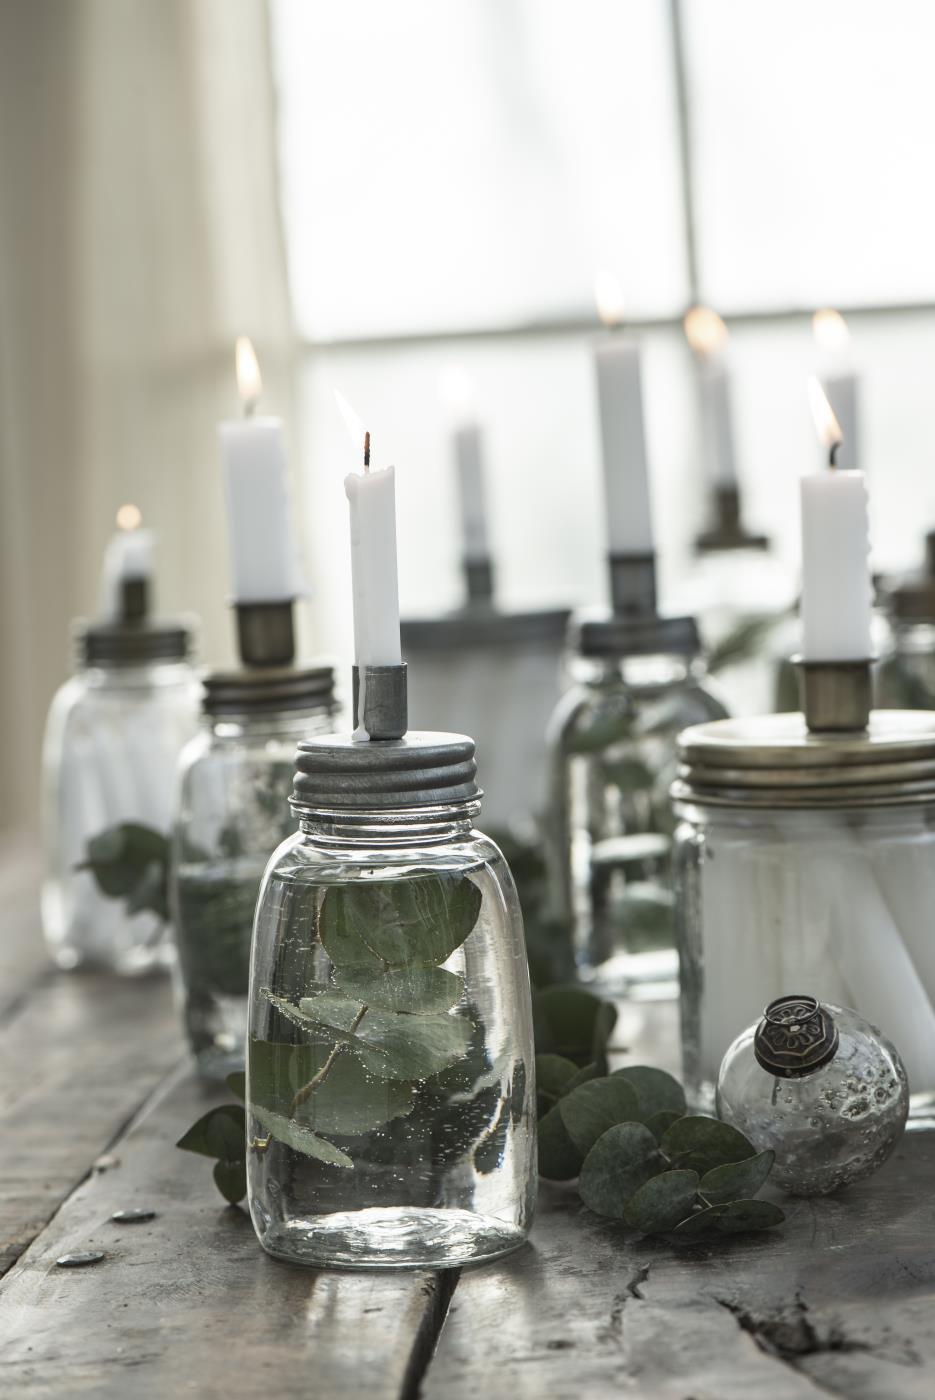 Kerzenhalter f/Stabkerze Metalldeckel niedrig - Ib Laursen